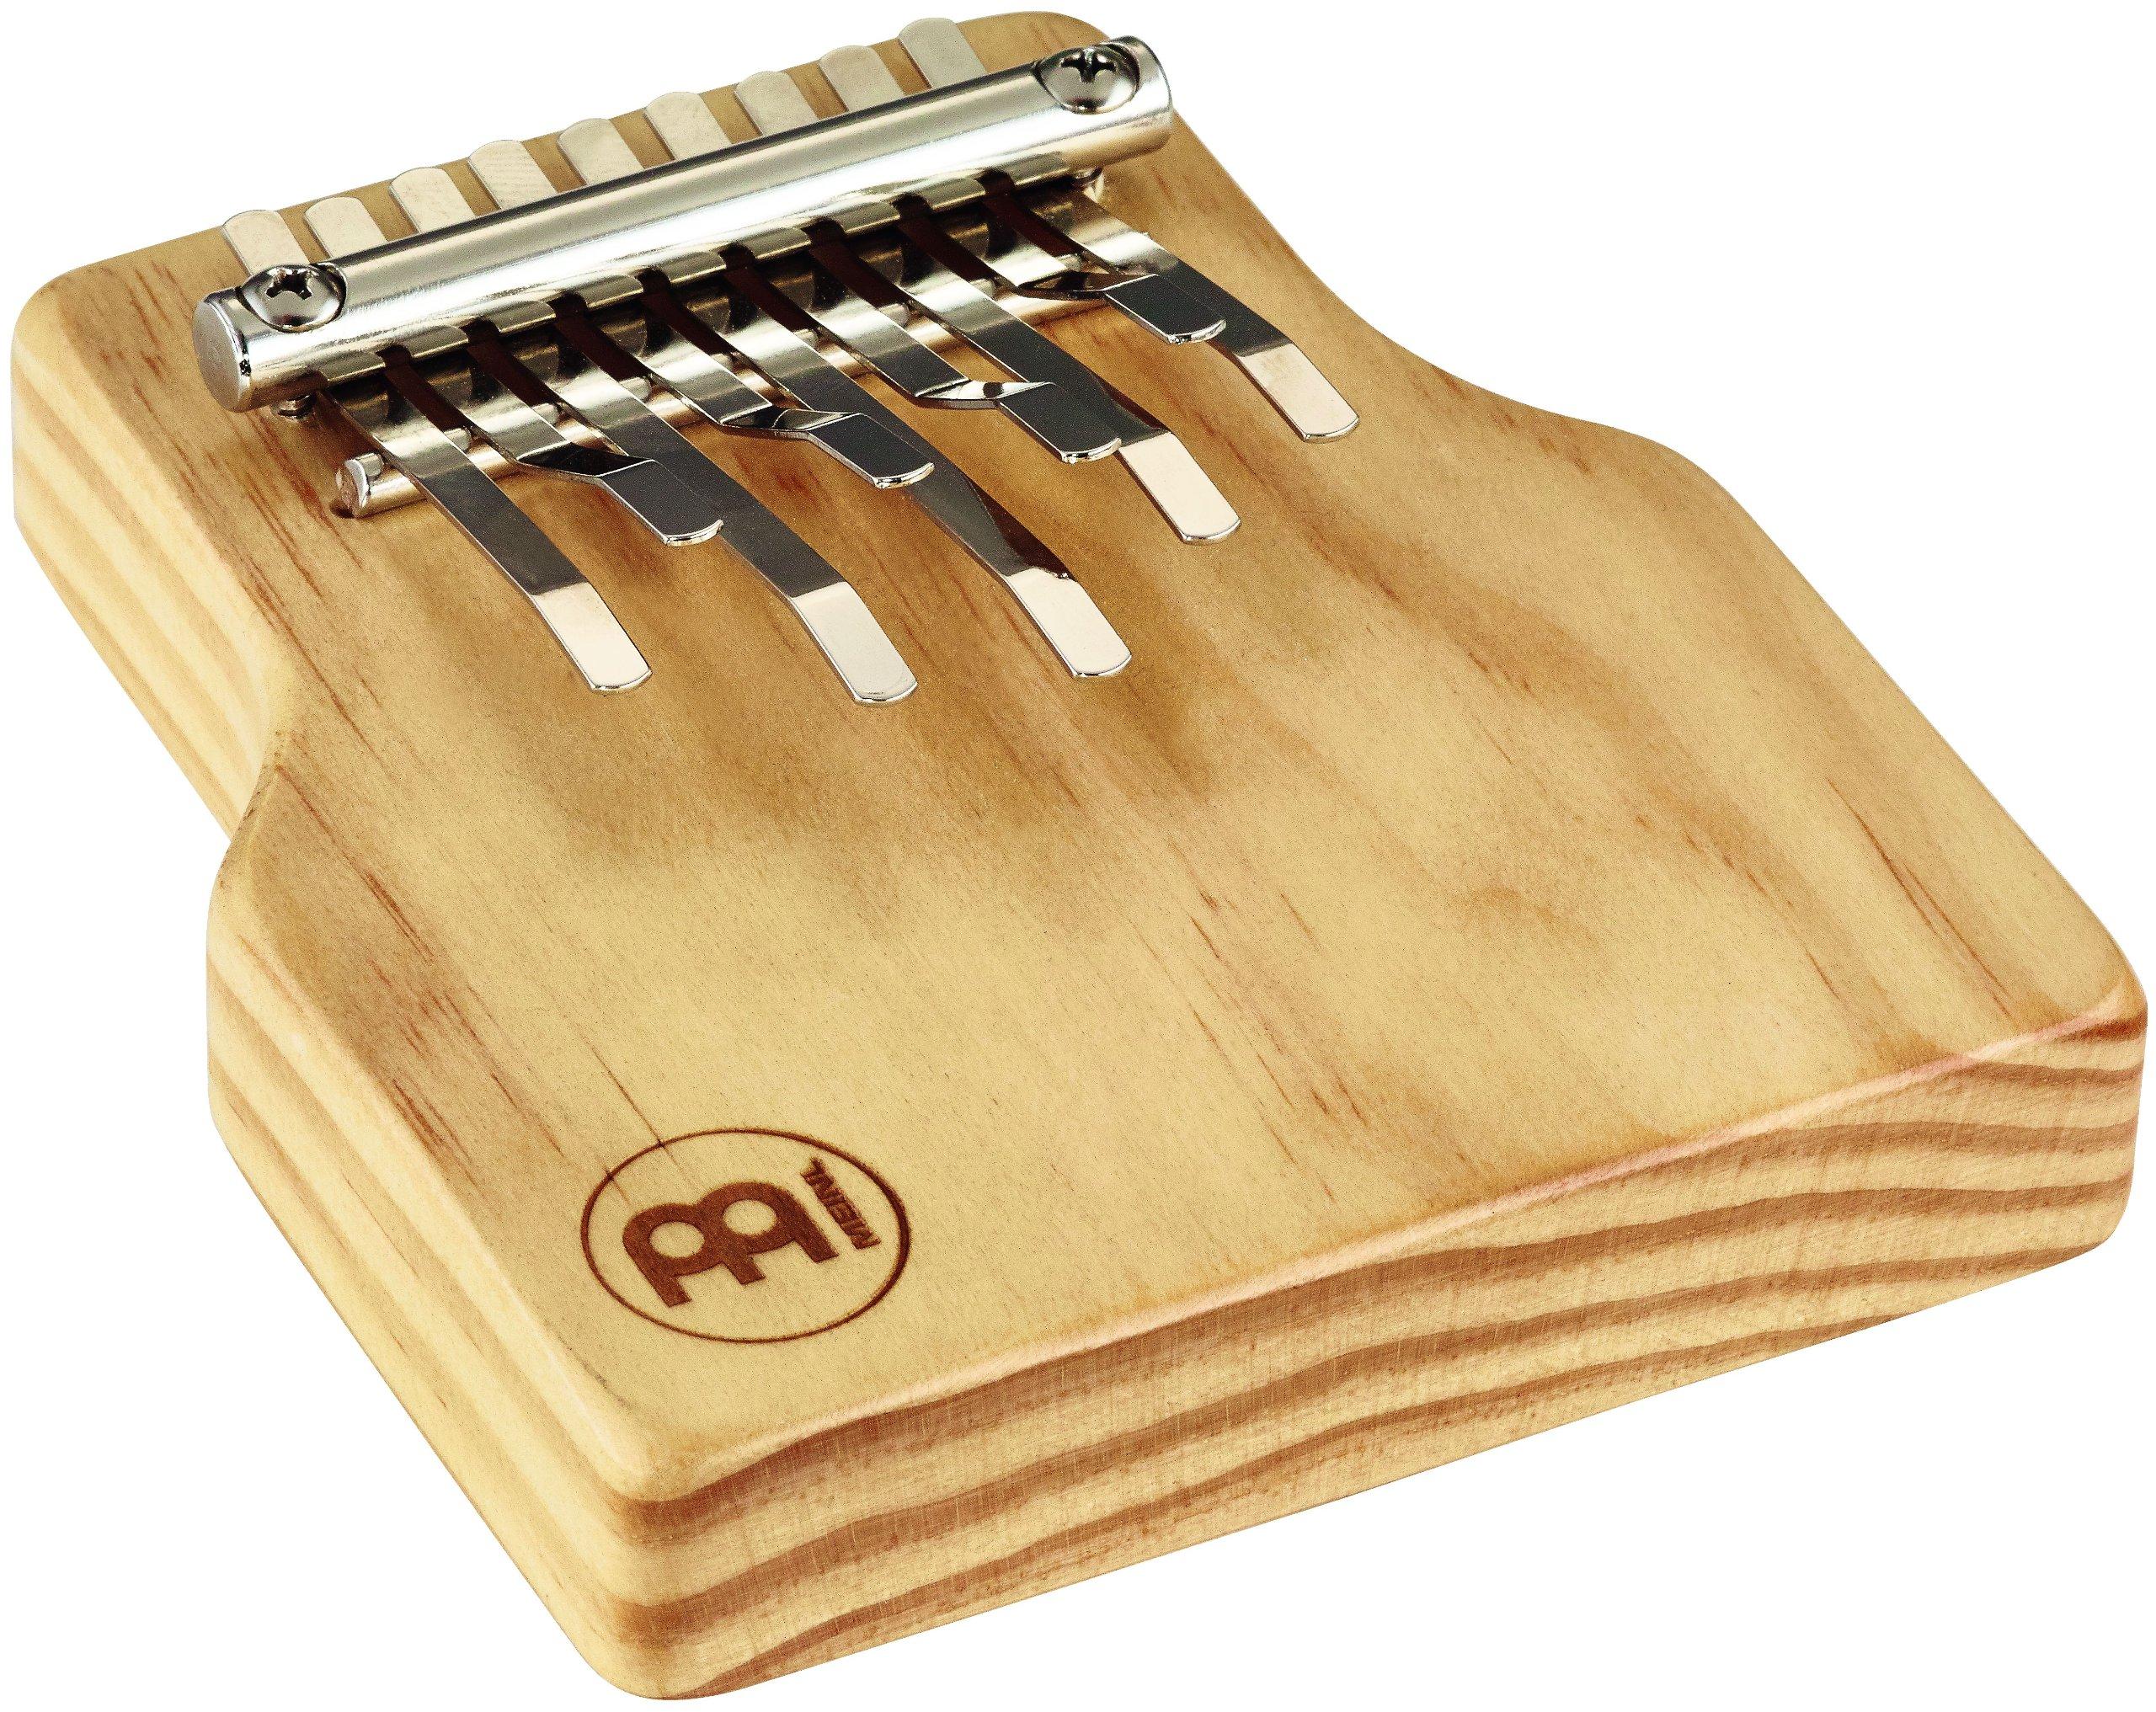 Meinl Percussion KA9-M Solid Wood Kalimba, Medium, Natural